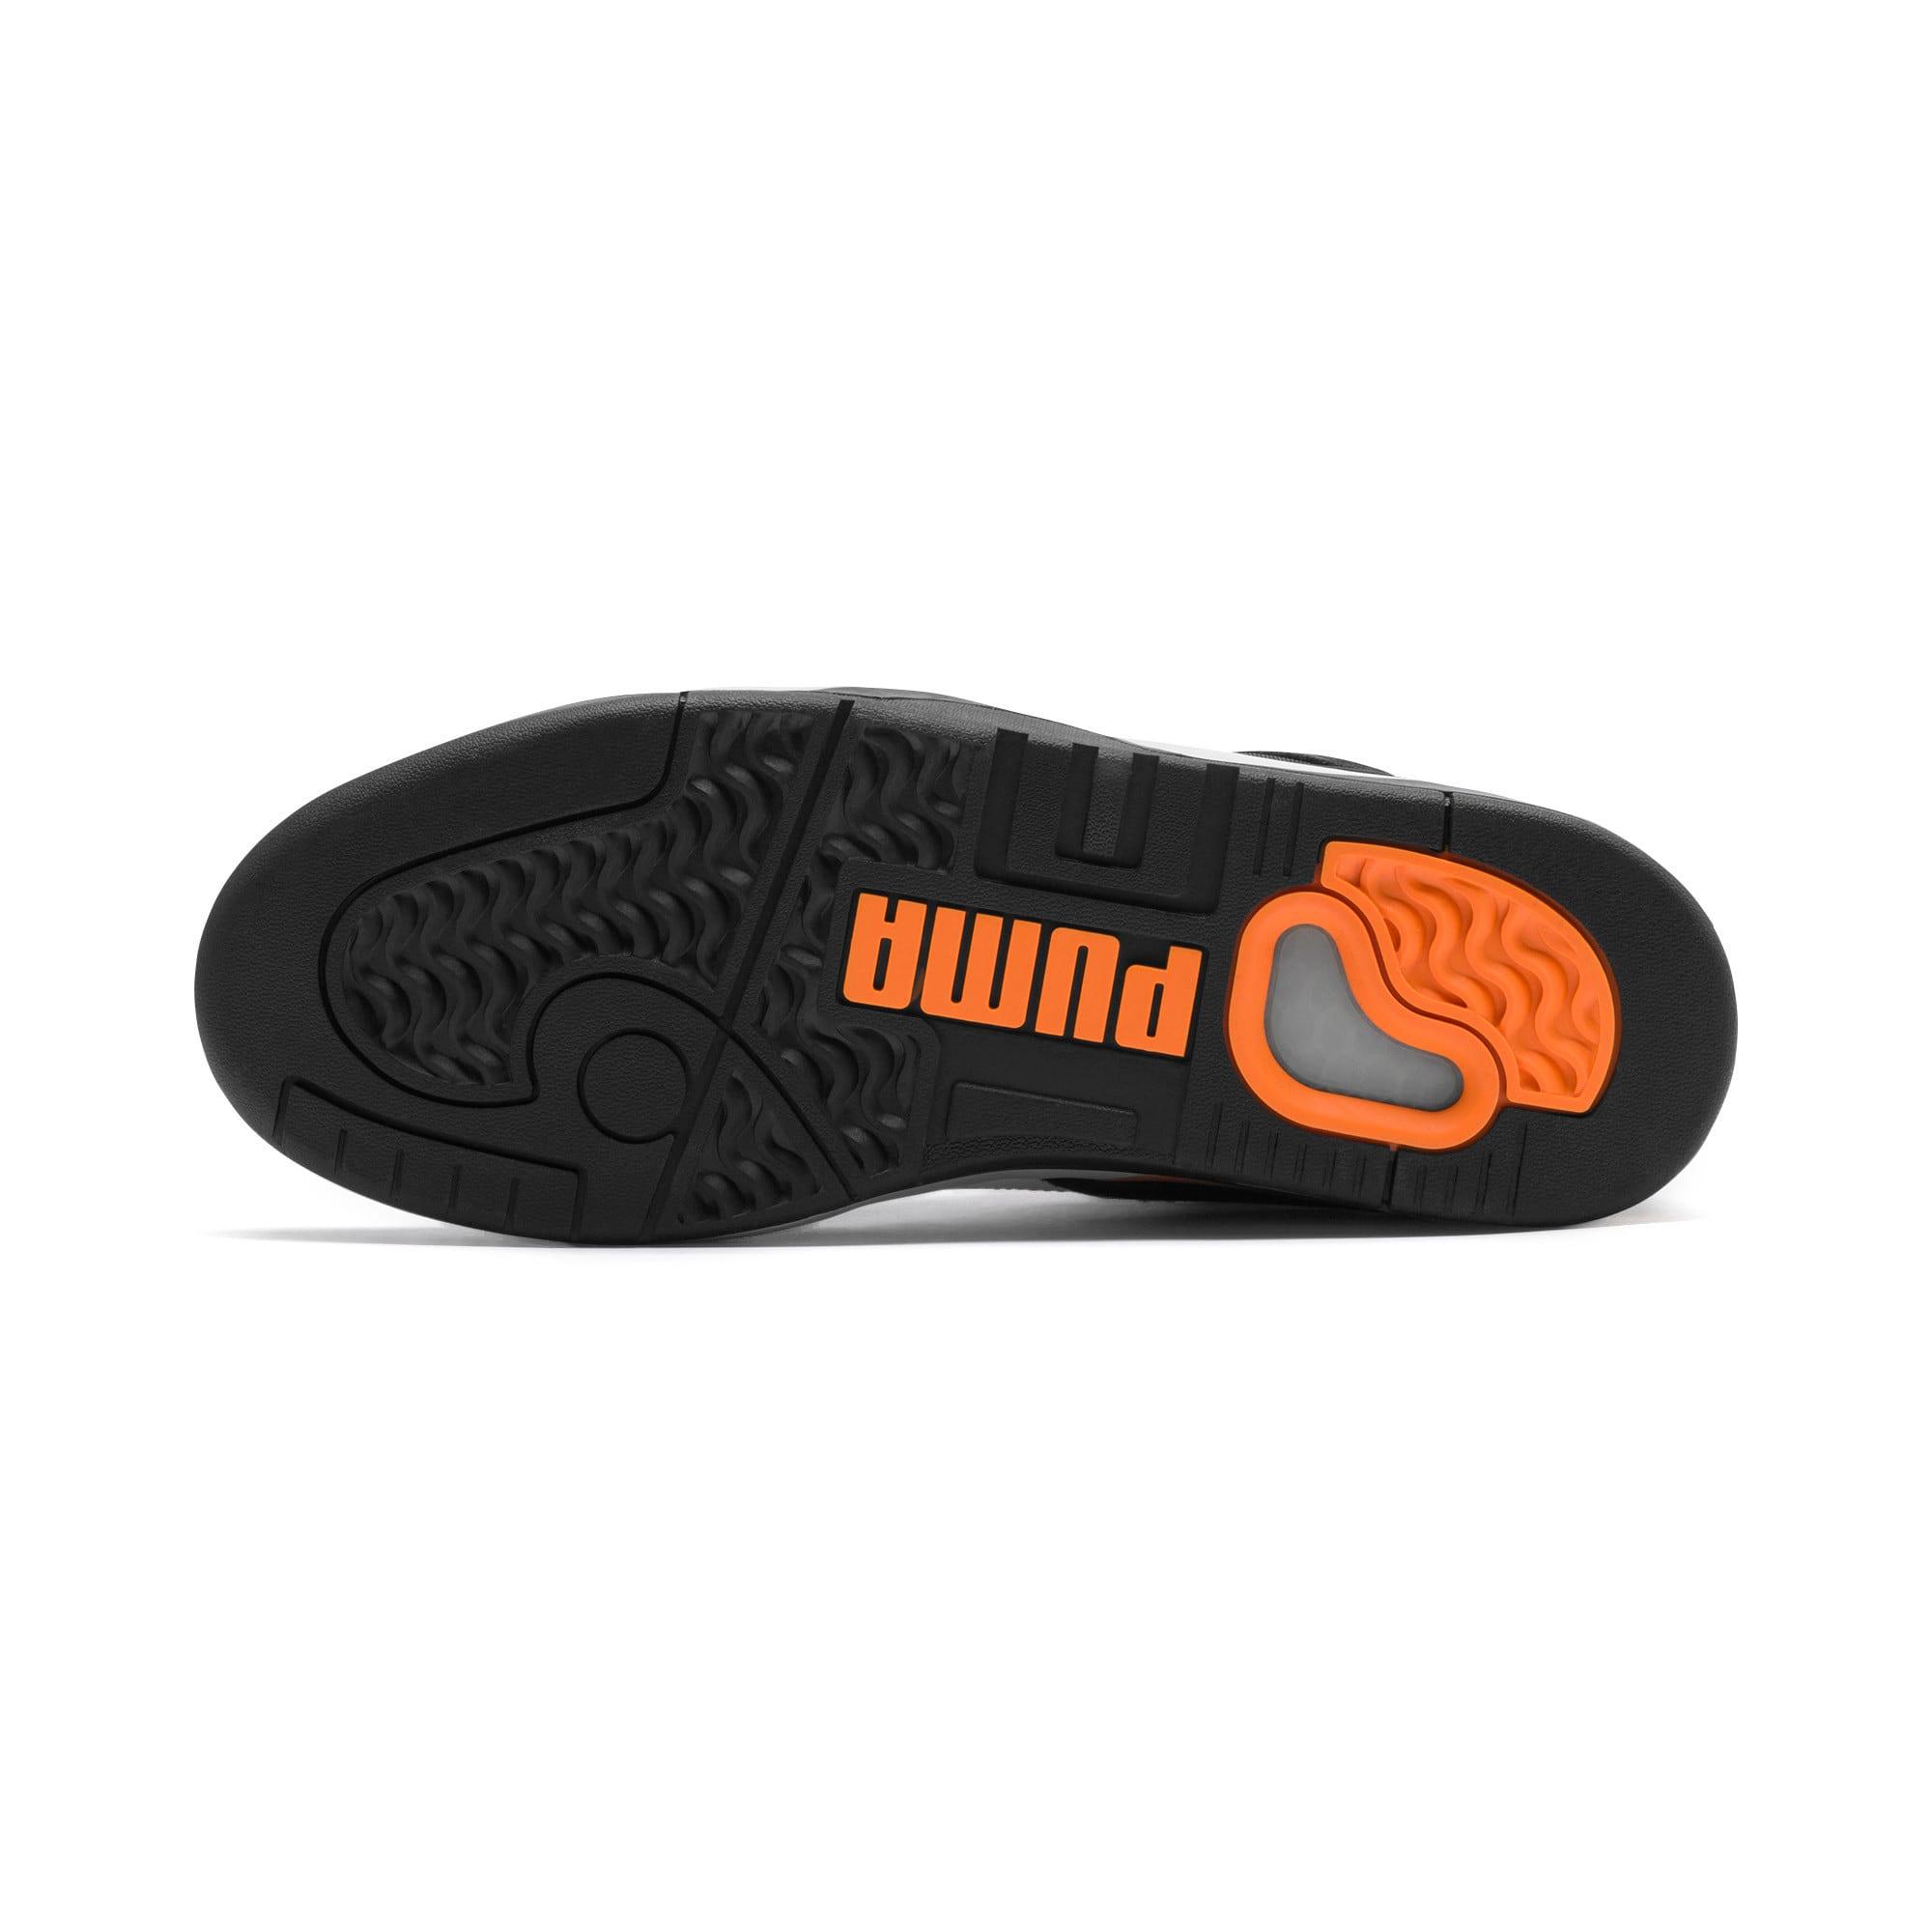 Thumbnail 4 of Palace Guard Bad Boys Sneaker, Puma Black-Puma White-, medium